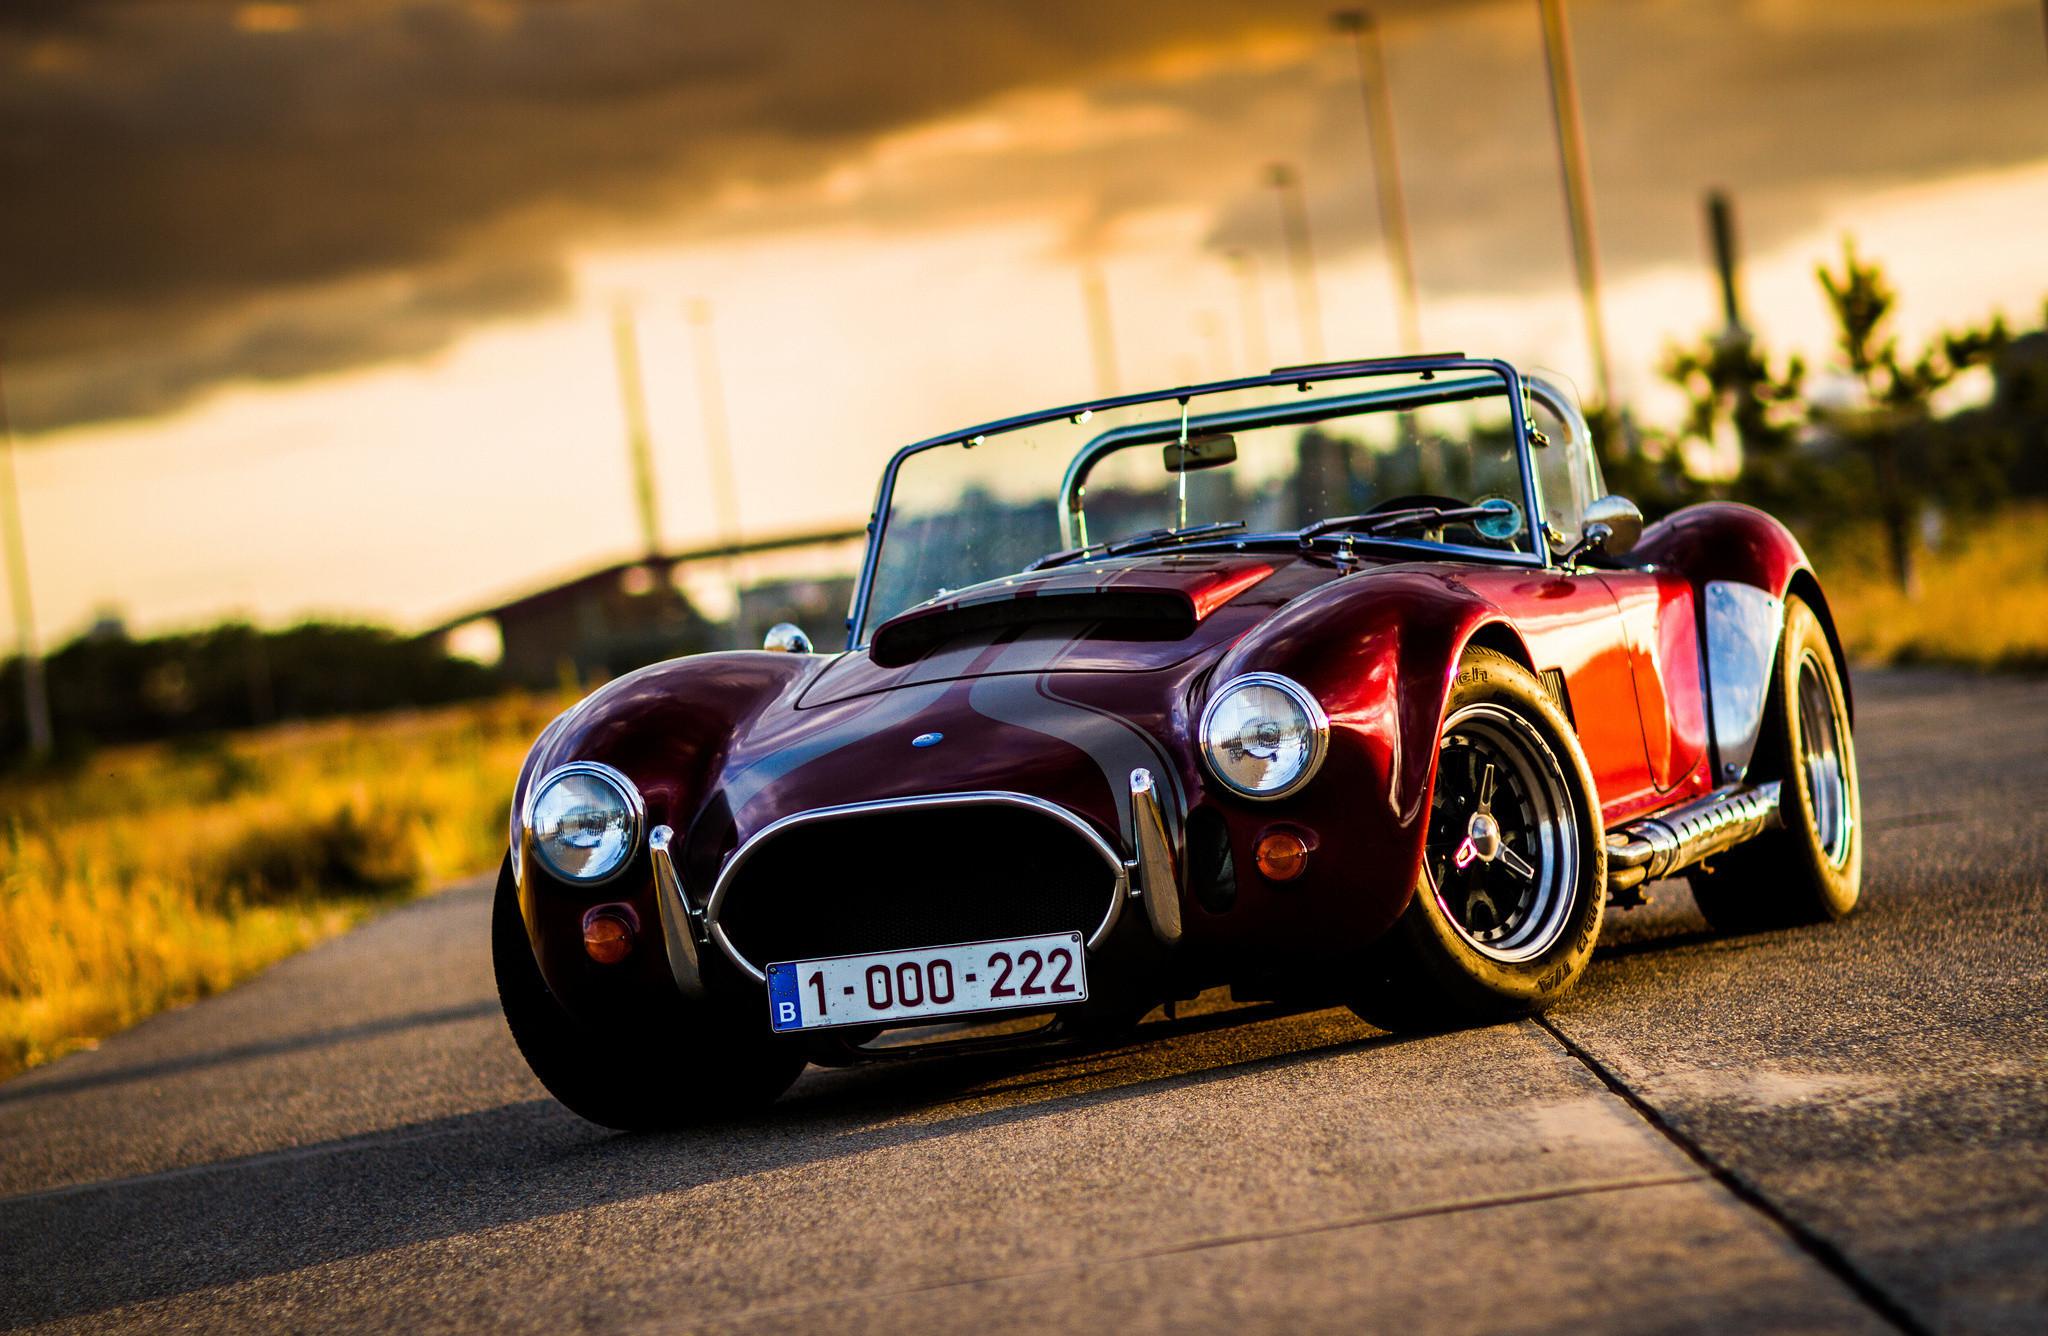 Cobra Classic Car Rod Ford Muscle Car Full HD Easy On The Eye Wallpaper  High Definition